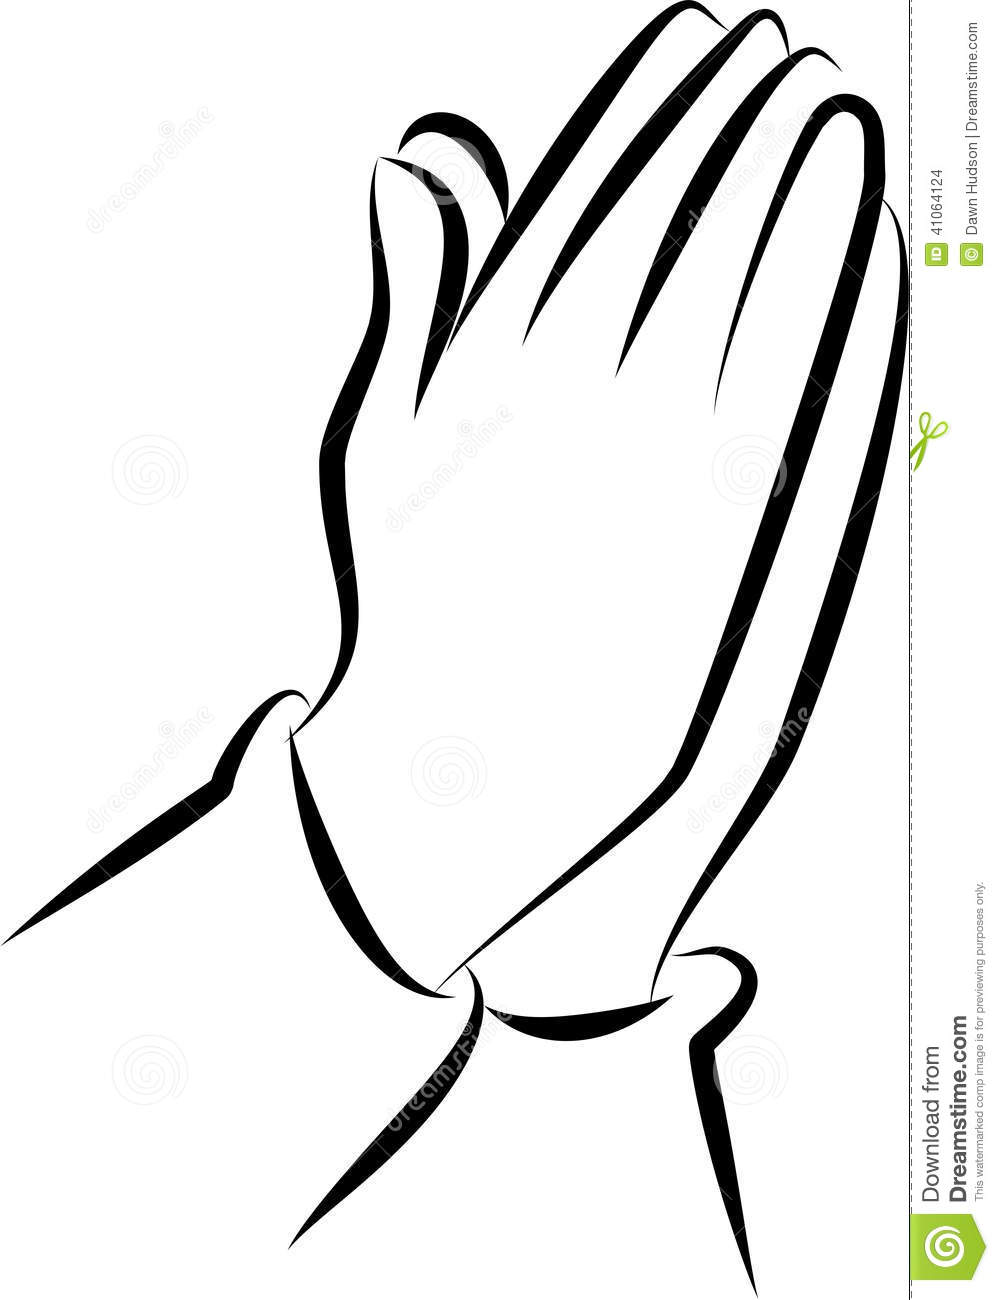 Rogar clipart svg stock 11 Simple Praying Hands Vector Images - Praying Hands Clip ... svg stock